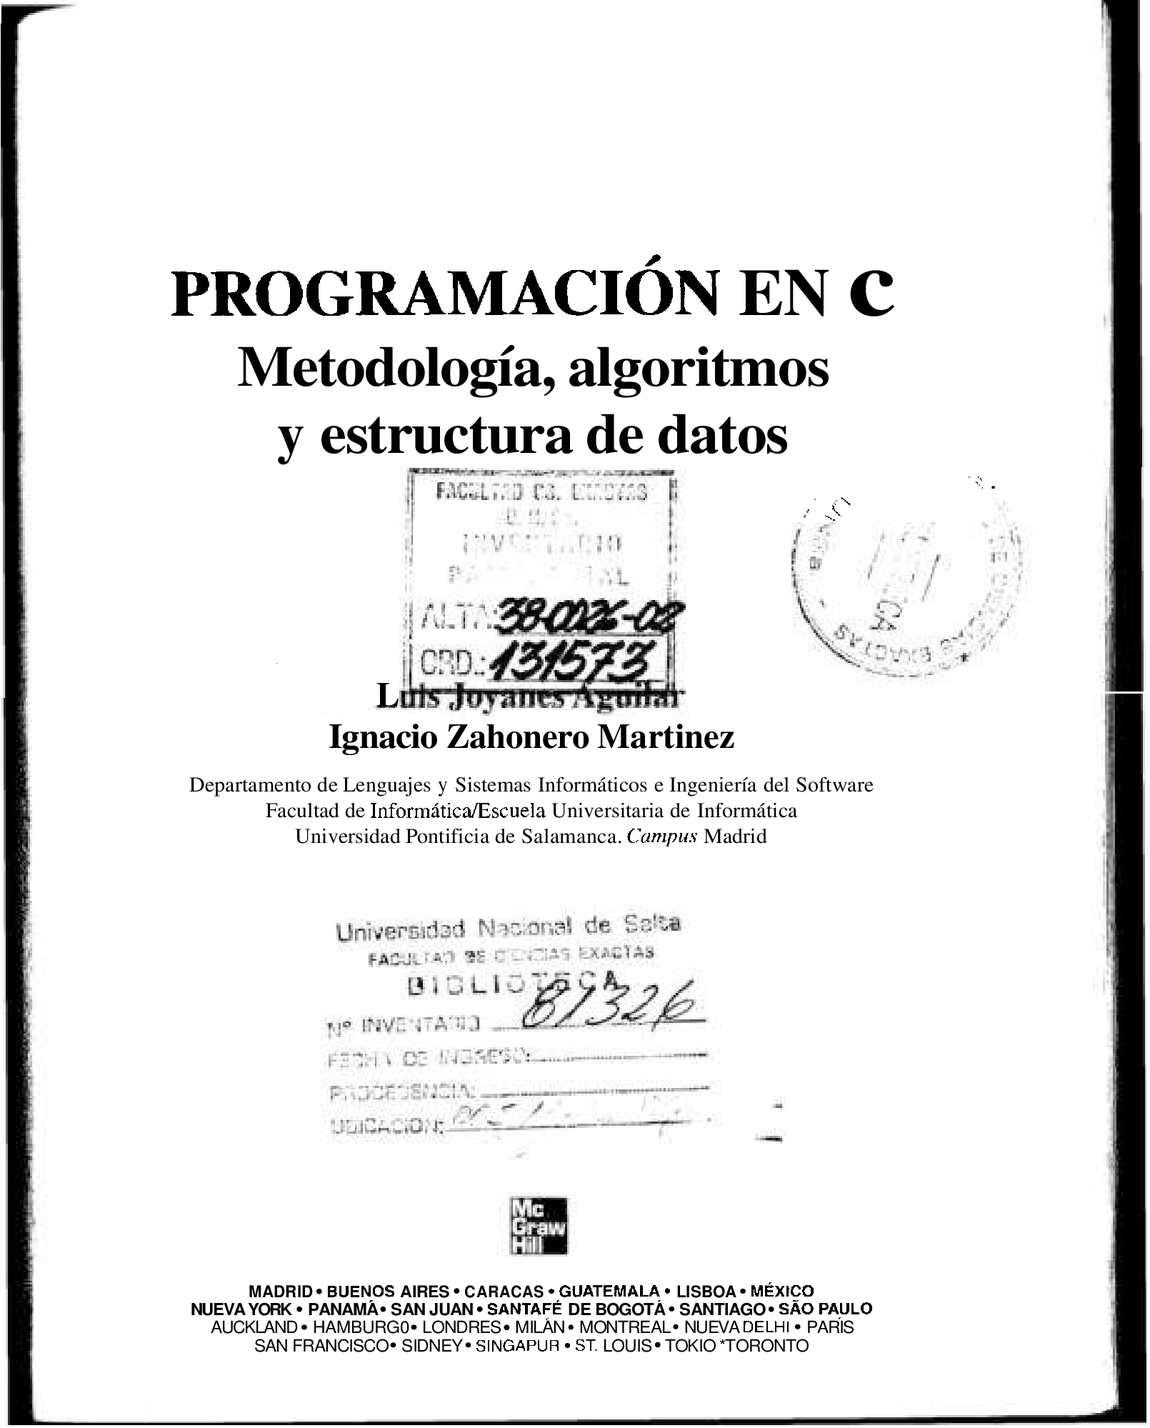 Programacion en C - Joyanes (student)